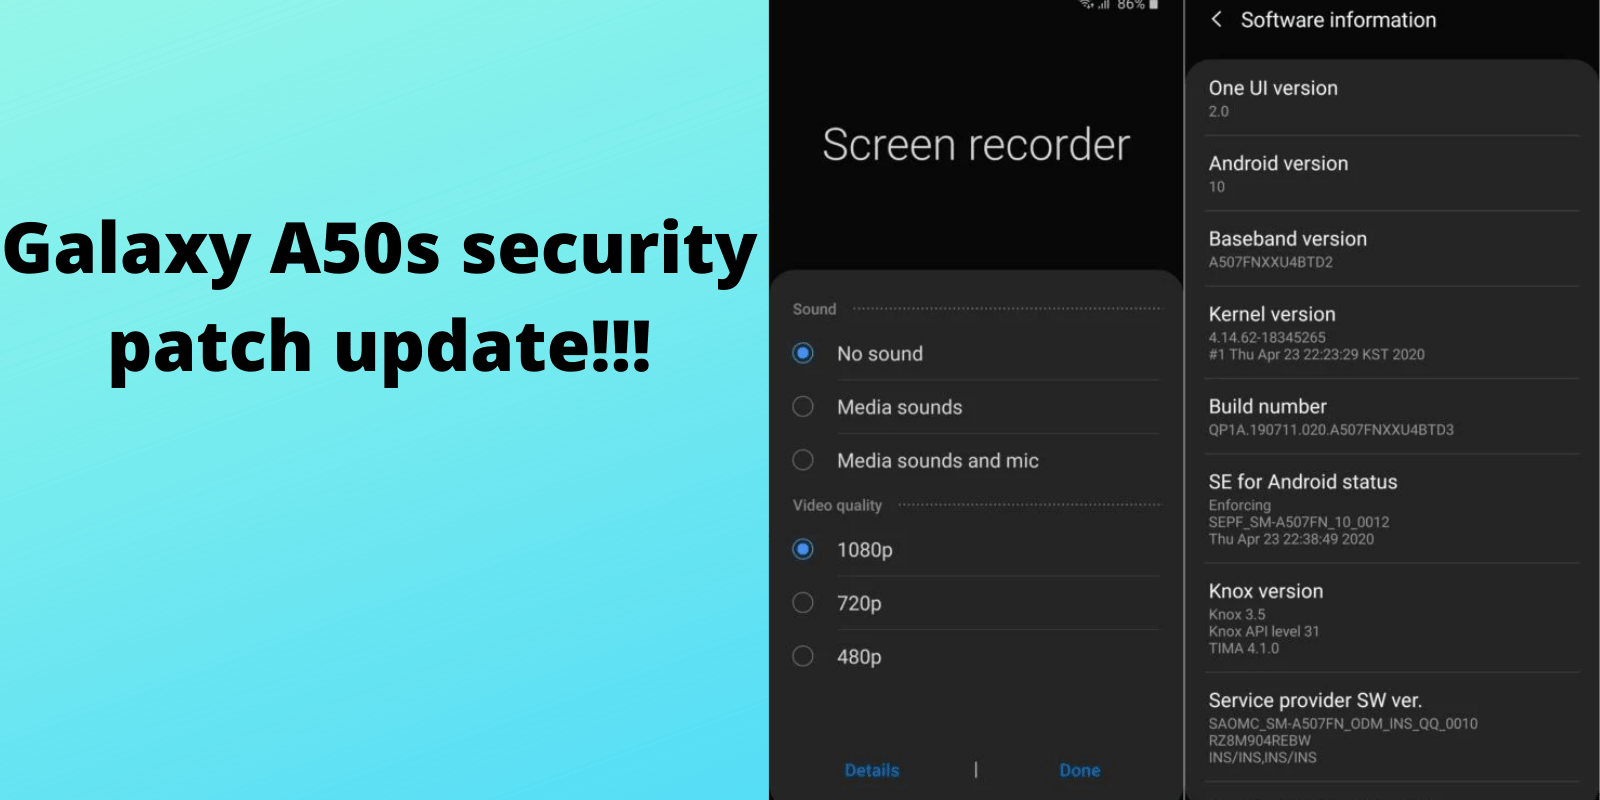 Galaxy A50s security patch update